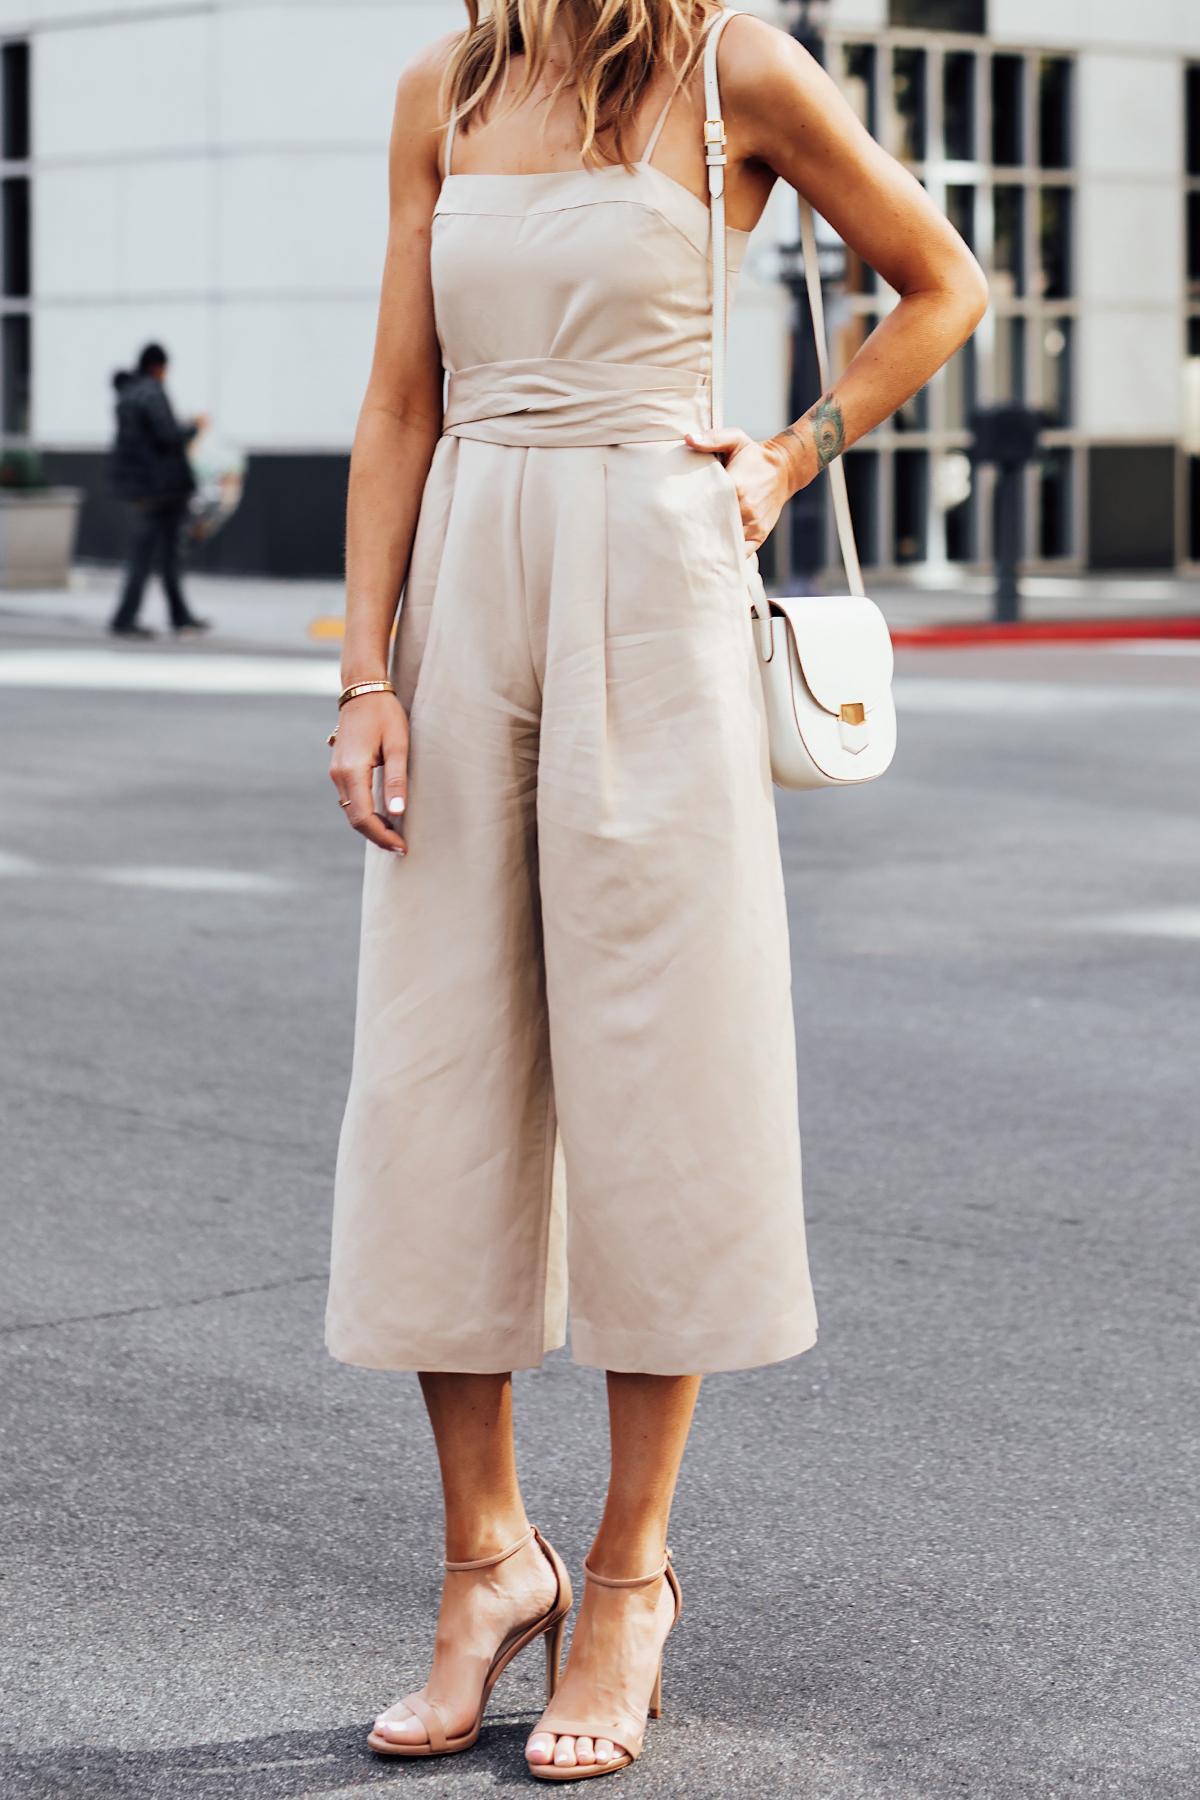 Blonde Woman Wearing Banana Republic Beige Linen Jumpsuit Nude Ankle Strap Heels White Handbag Fashion Jackson San Diego Fashion Blogger Street Style